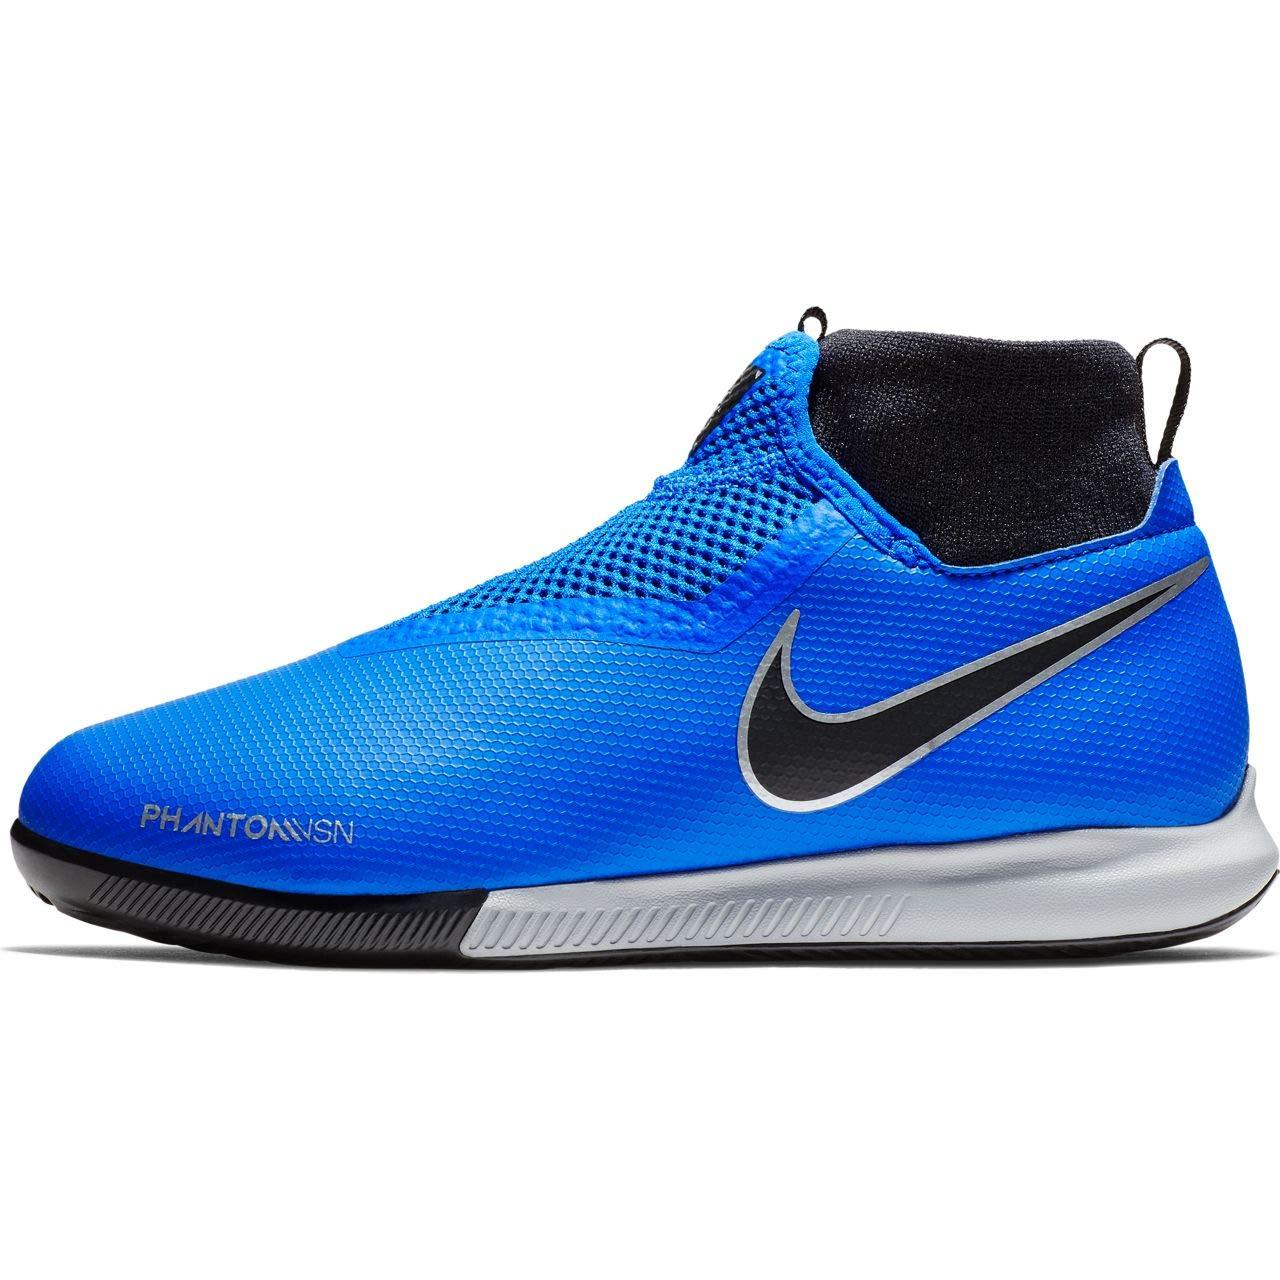 Schuhe Nike Kinder Fussball Hallenschuhe Phantom Vision